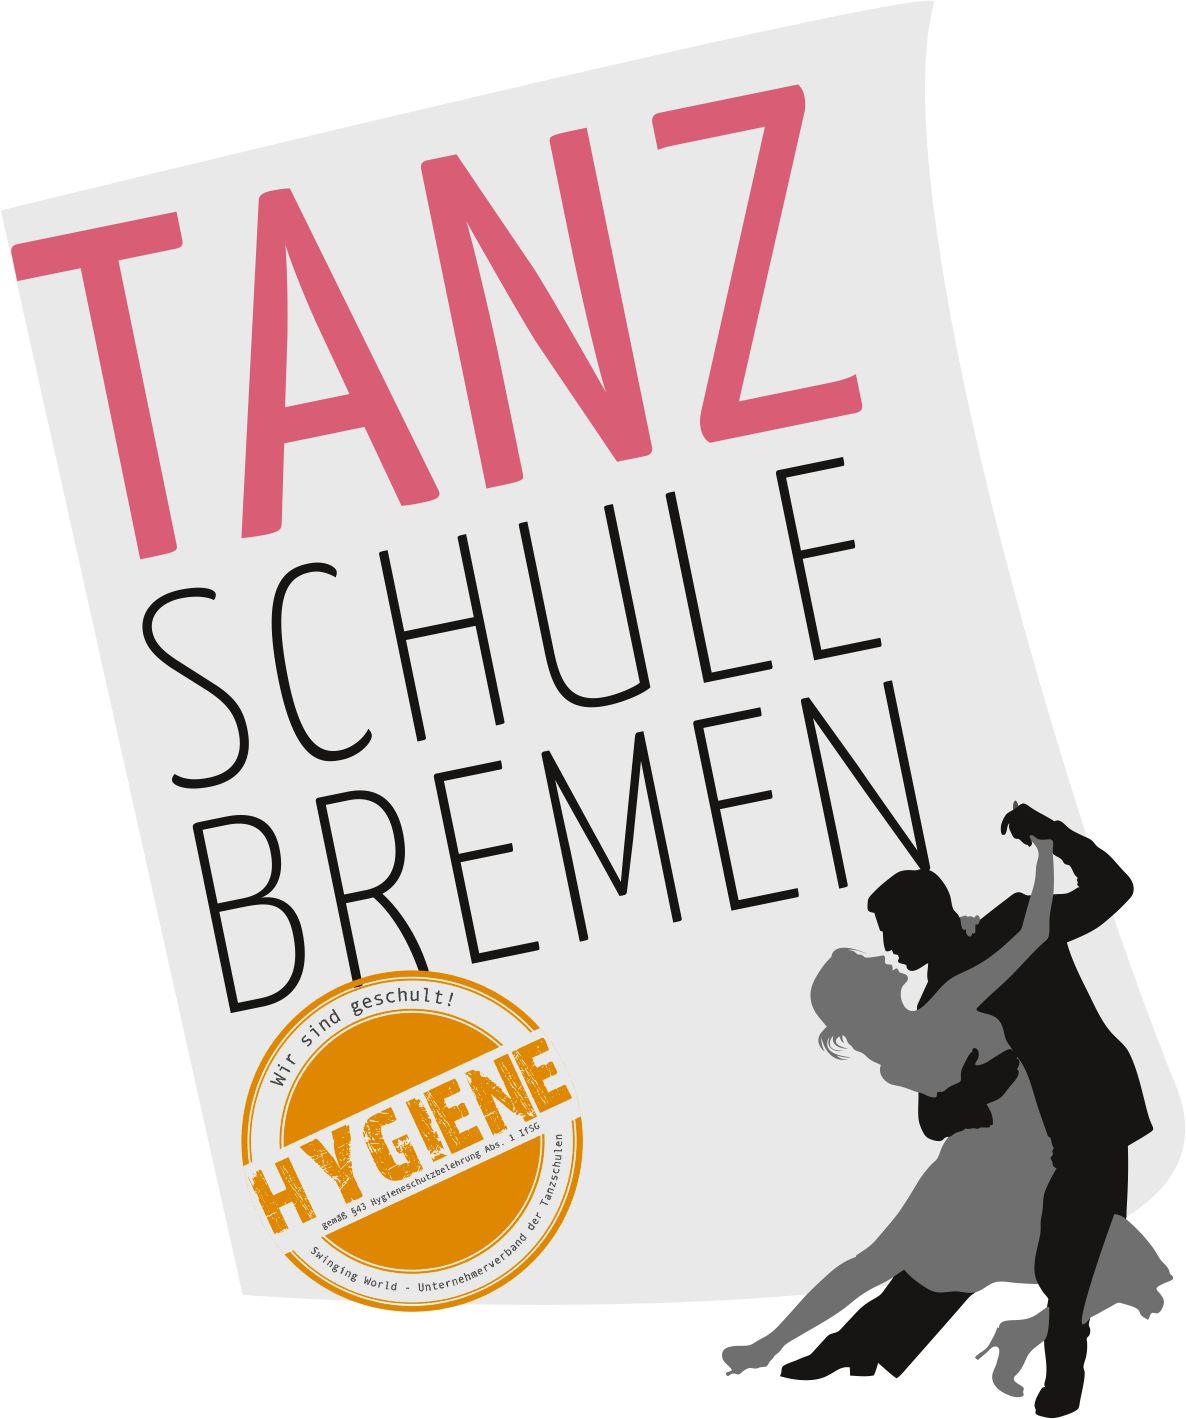 ADTV Tanzschule Bremen